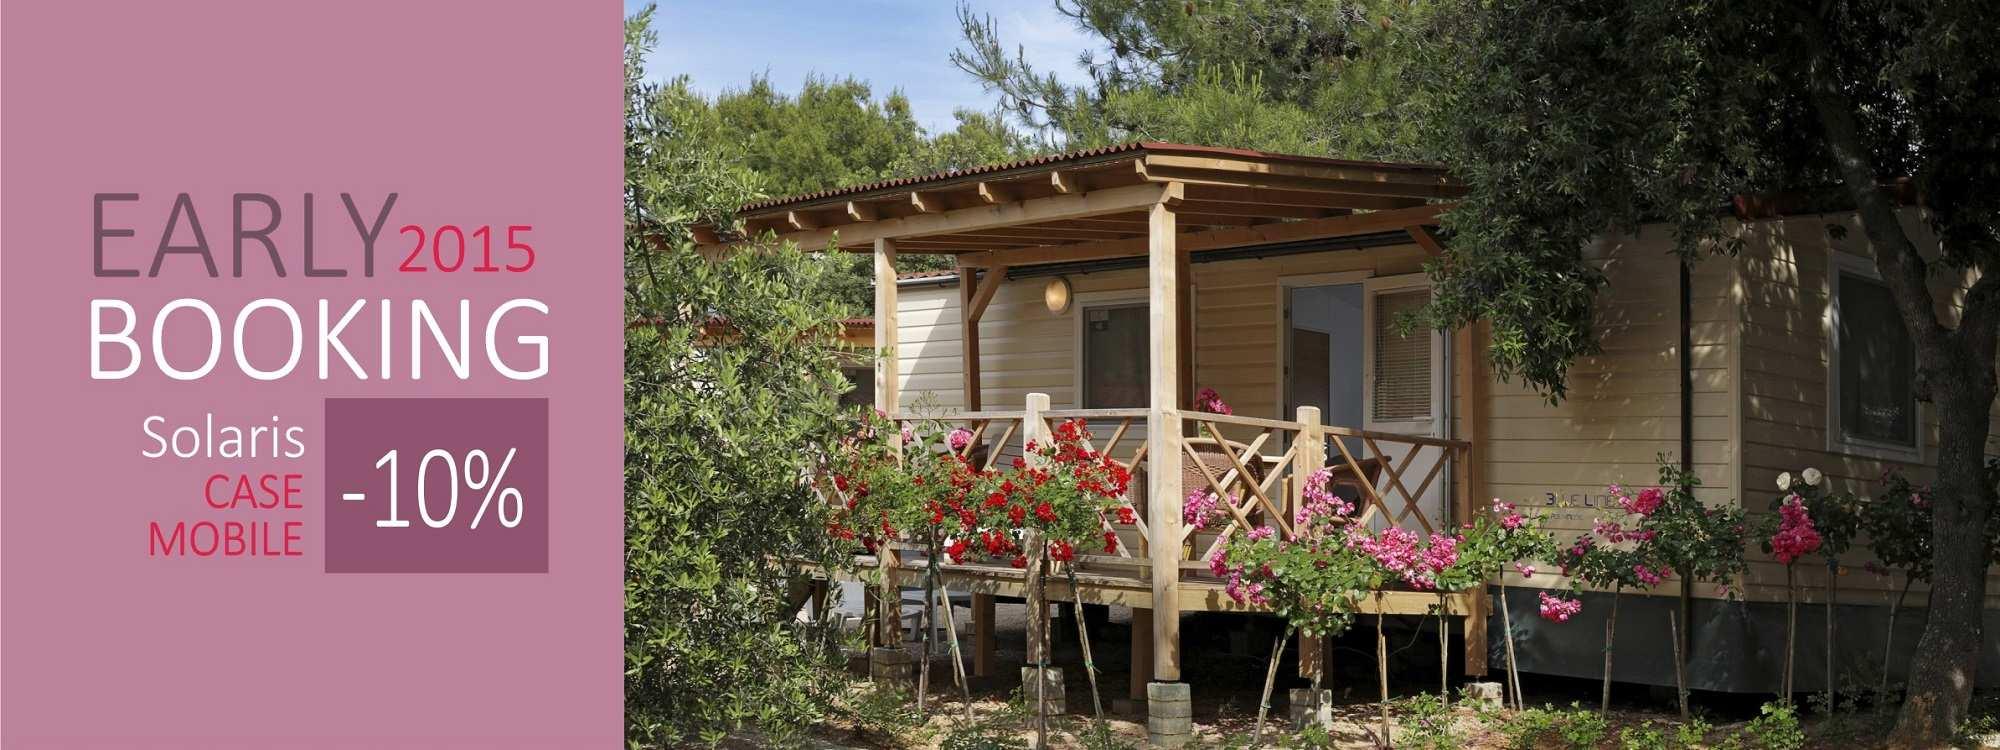 Early_booking_offerta_case_mobile_solaris_camping_beach_resort_offerta_croazia